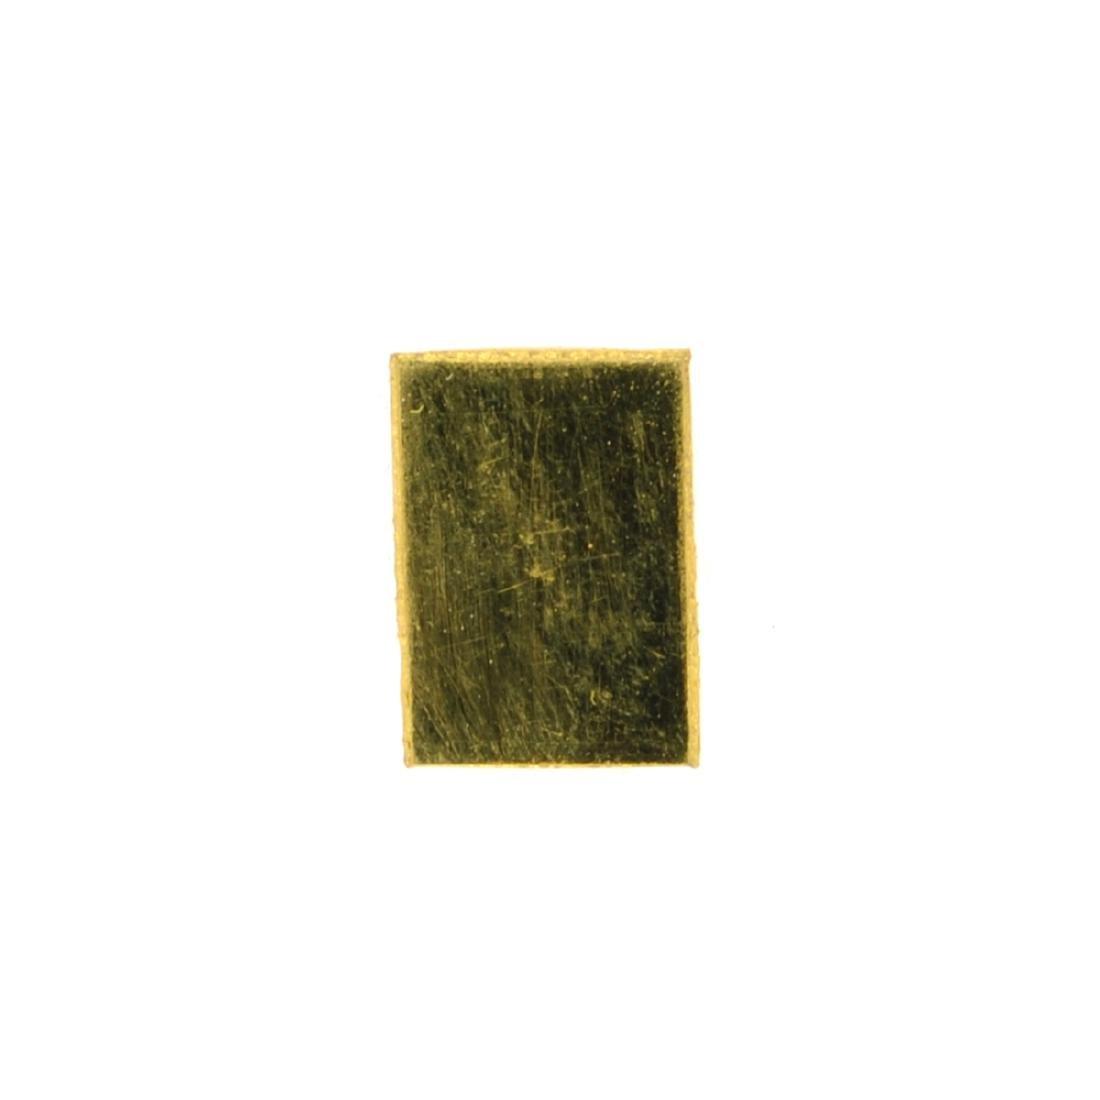 Beautiful 1 gram Valcambi Suisse Fine Gold Bar - 2